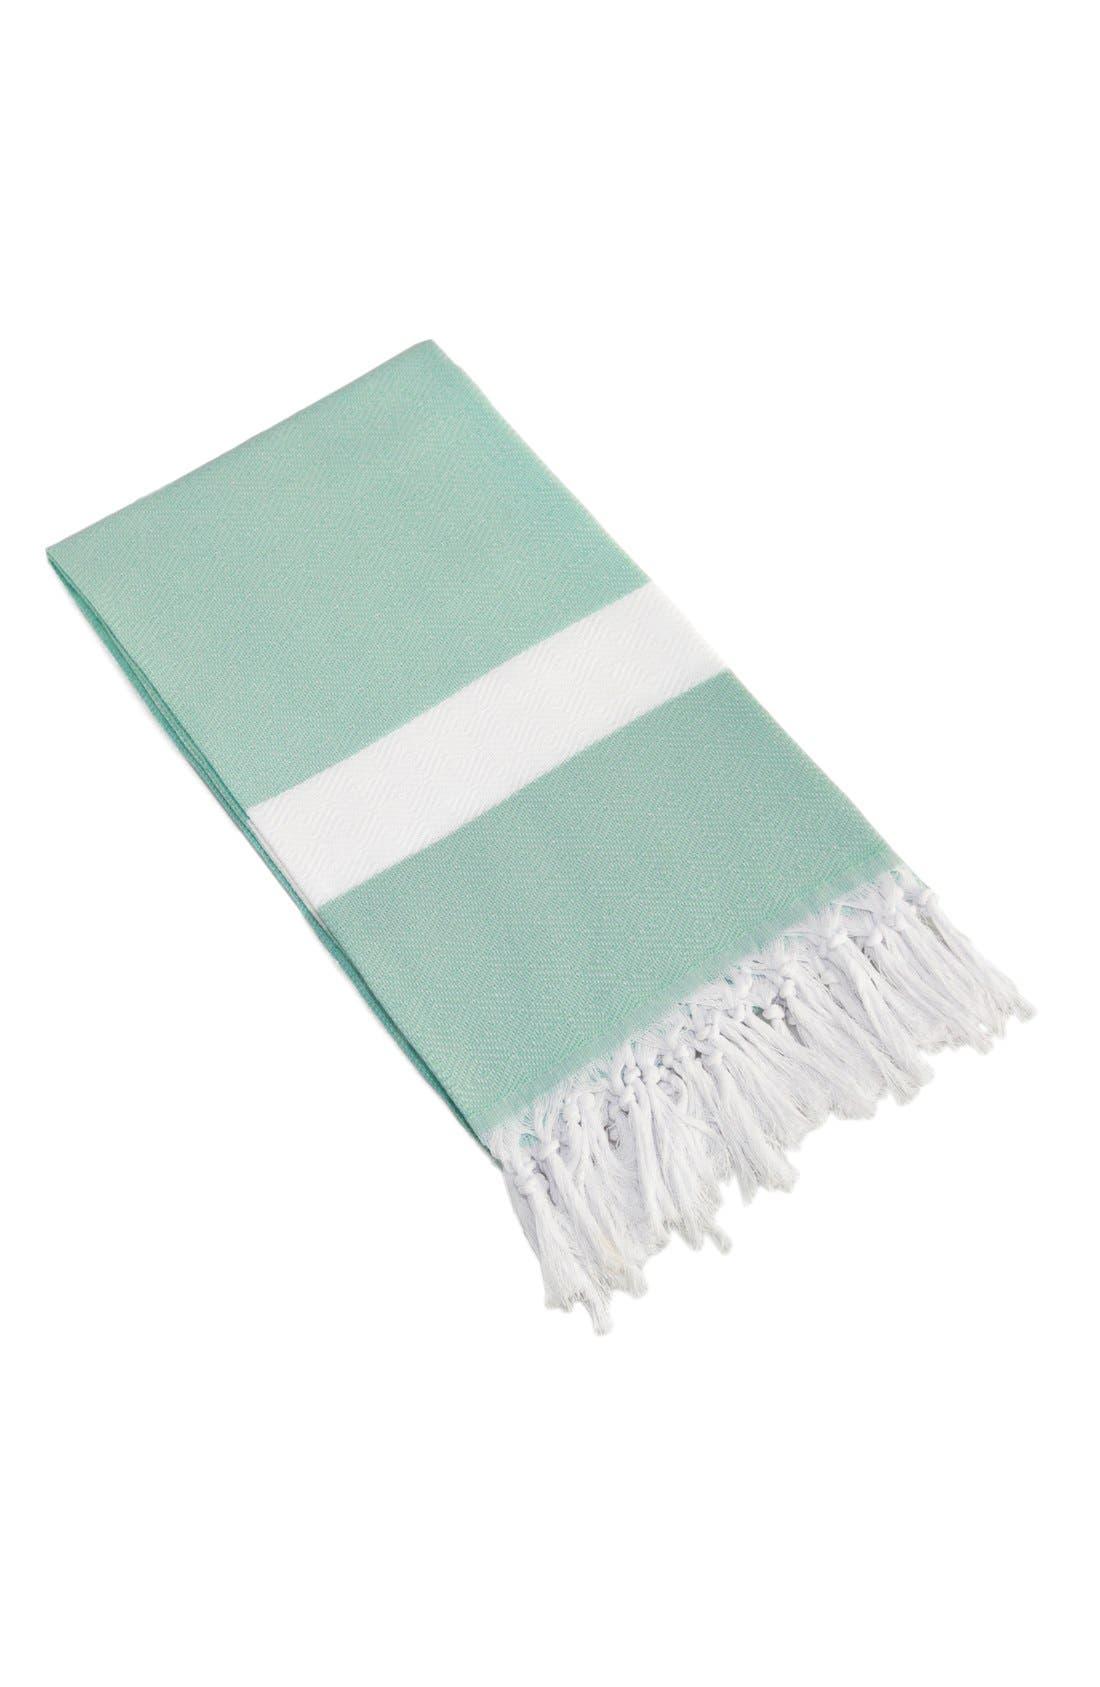 Alternate Image 1 Selected - Linum Home Textiles 'Diamond' Turkish Pestemal Towel